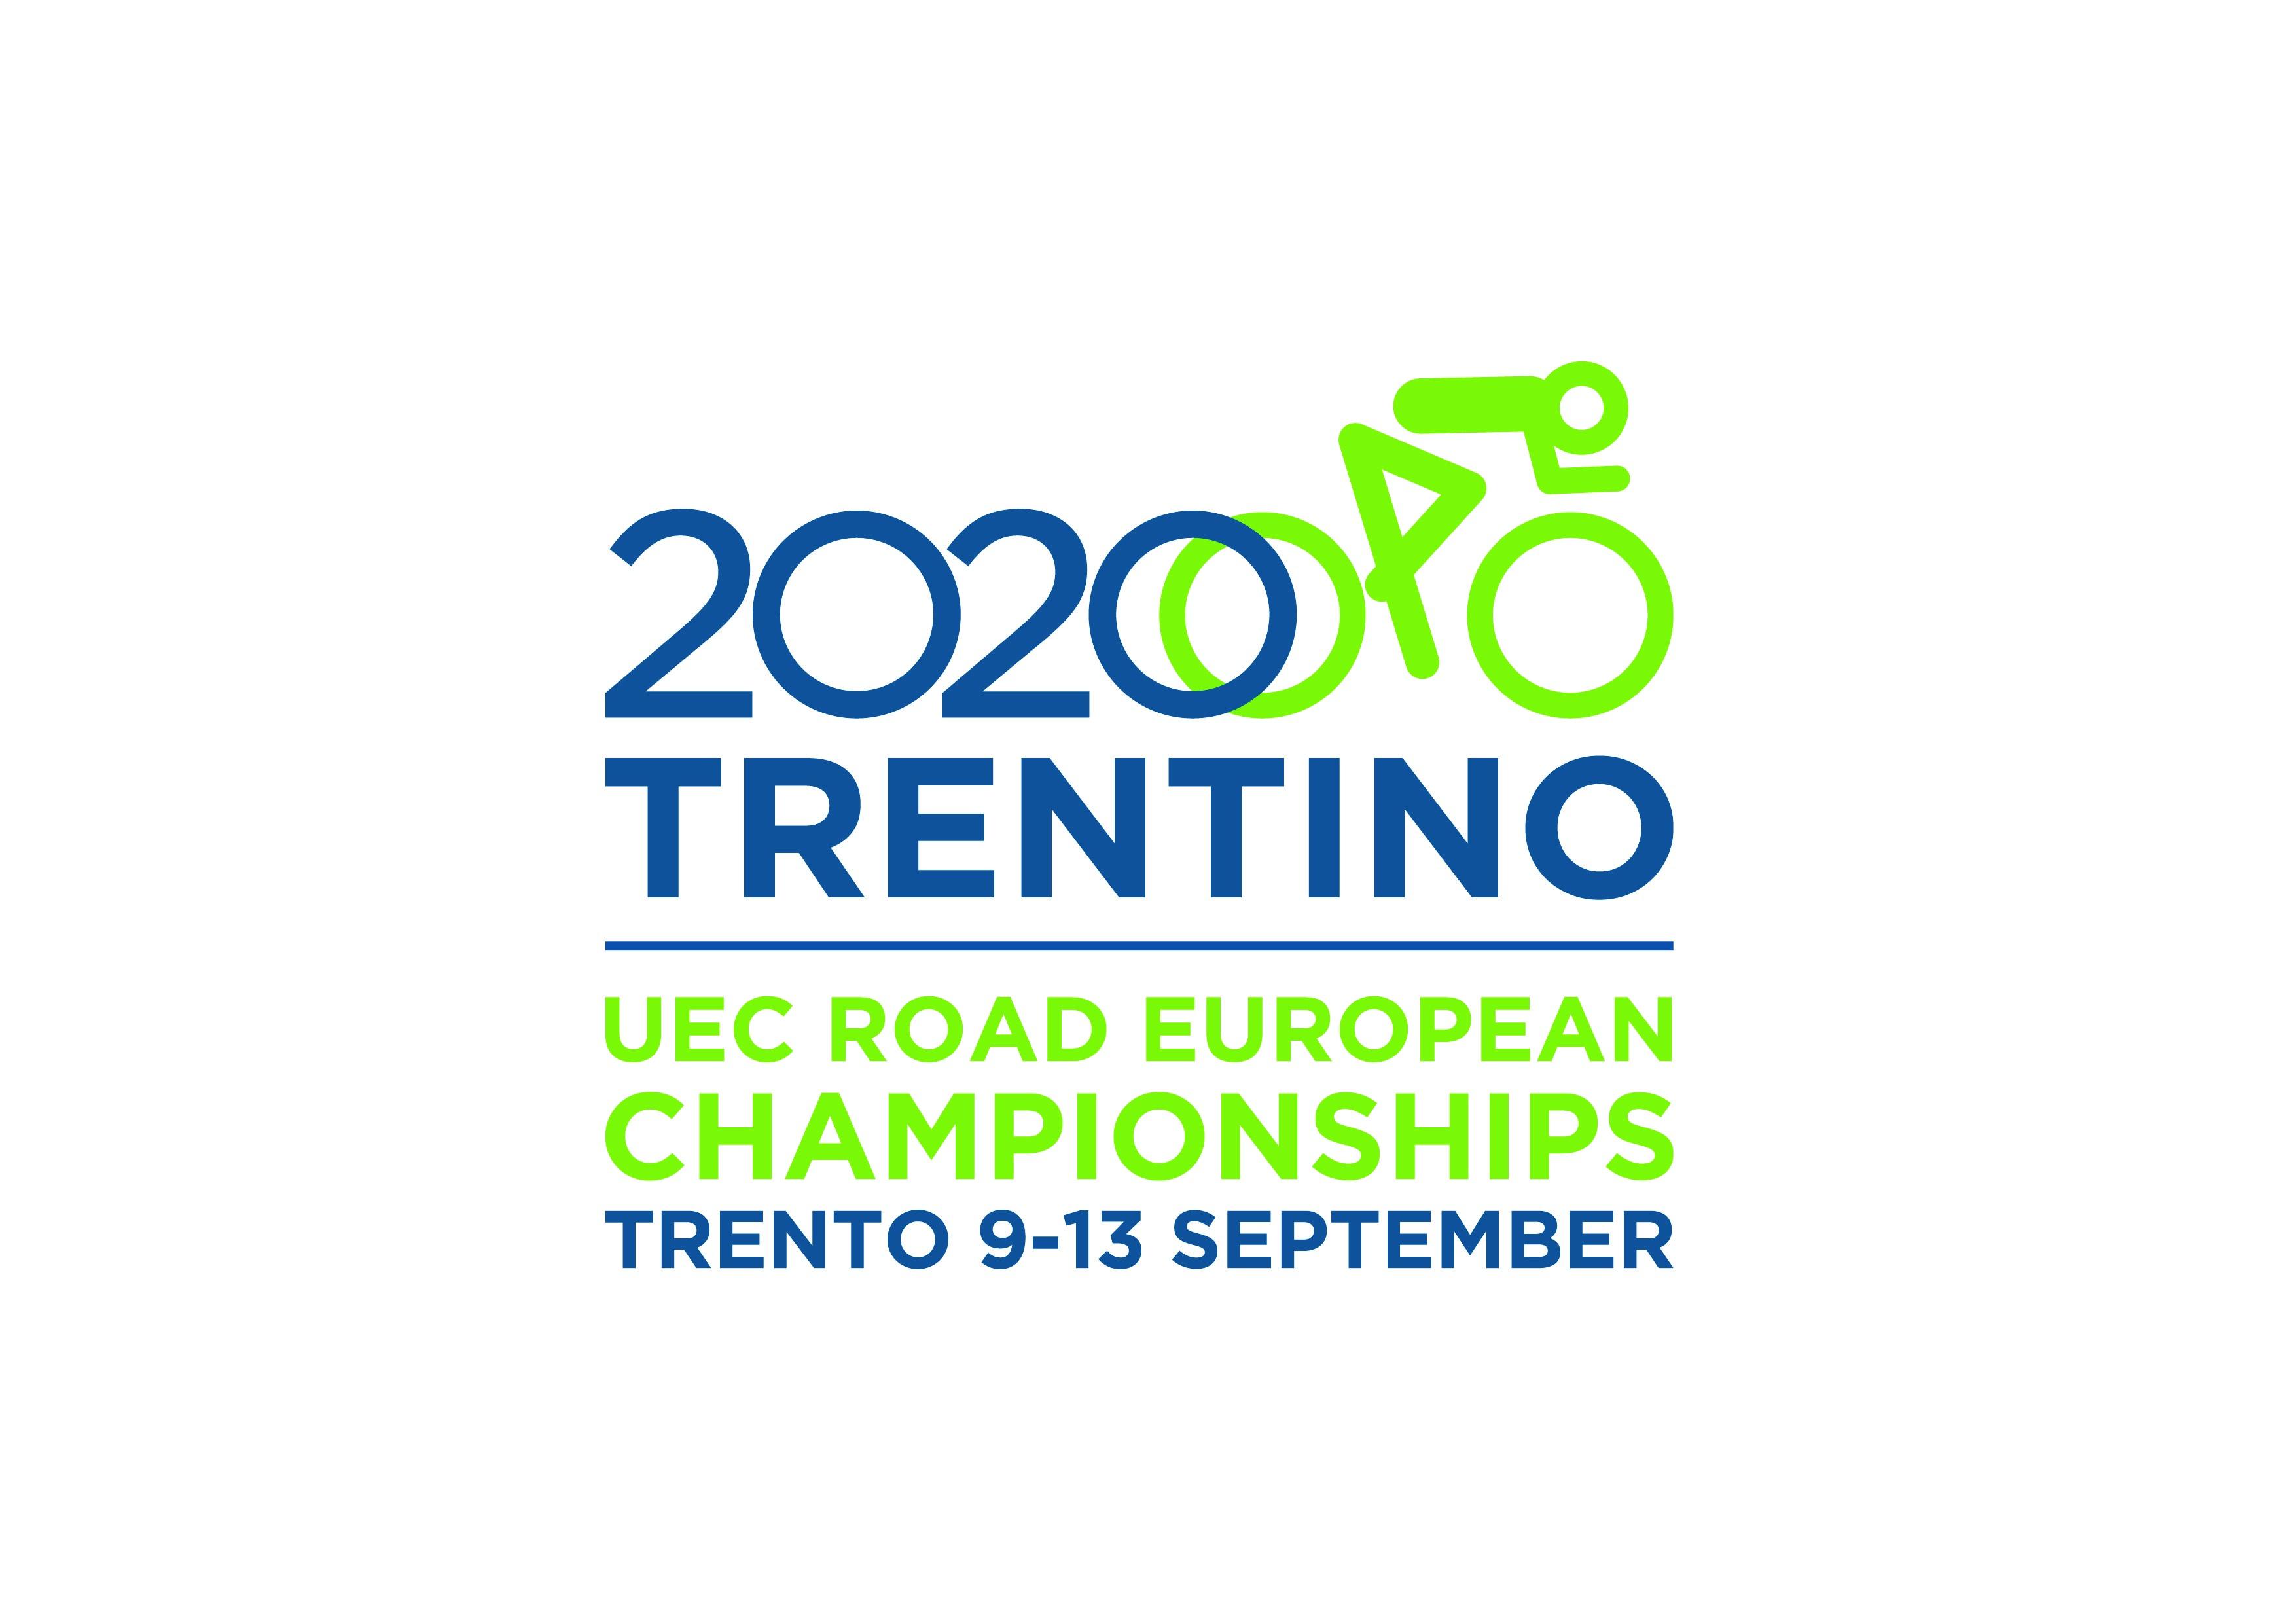 Calendrier Portugal Euro 2020.2020 Uec Road European Championships Uec Union